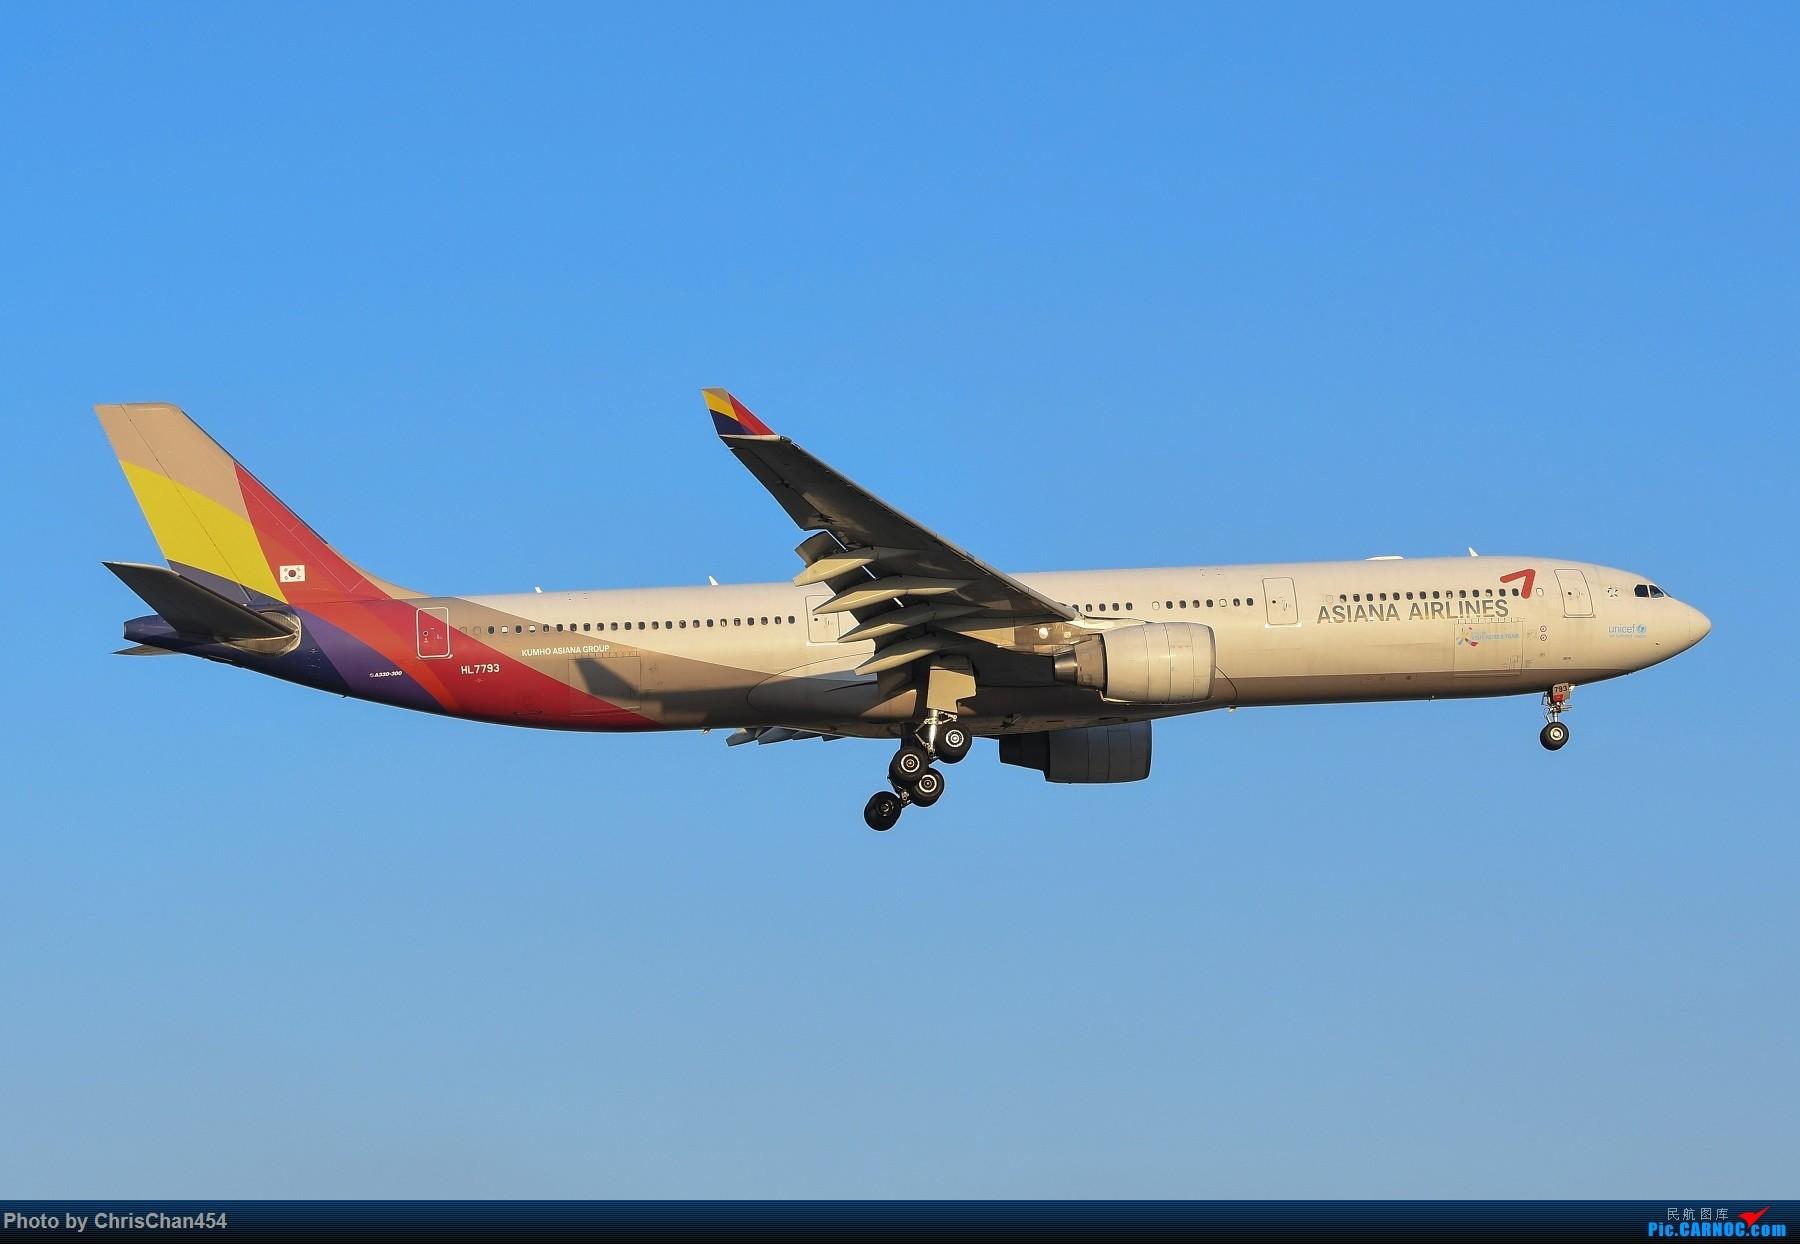 Re:[原创]国庆虹桥,终于拍到2447! AIRBUS A330-300 HL7793 中国上海虹桥国际机场